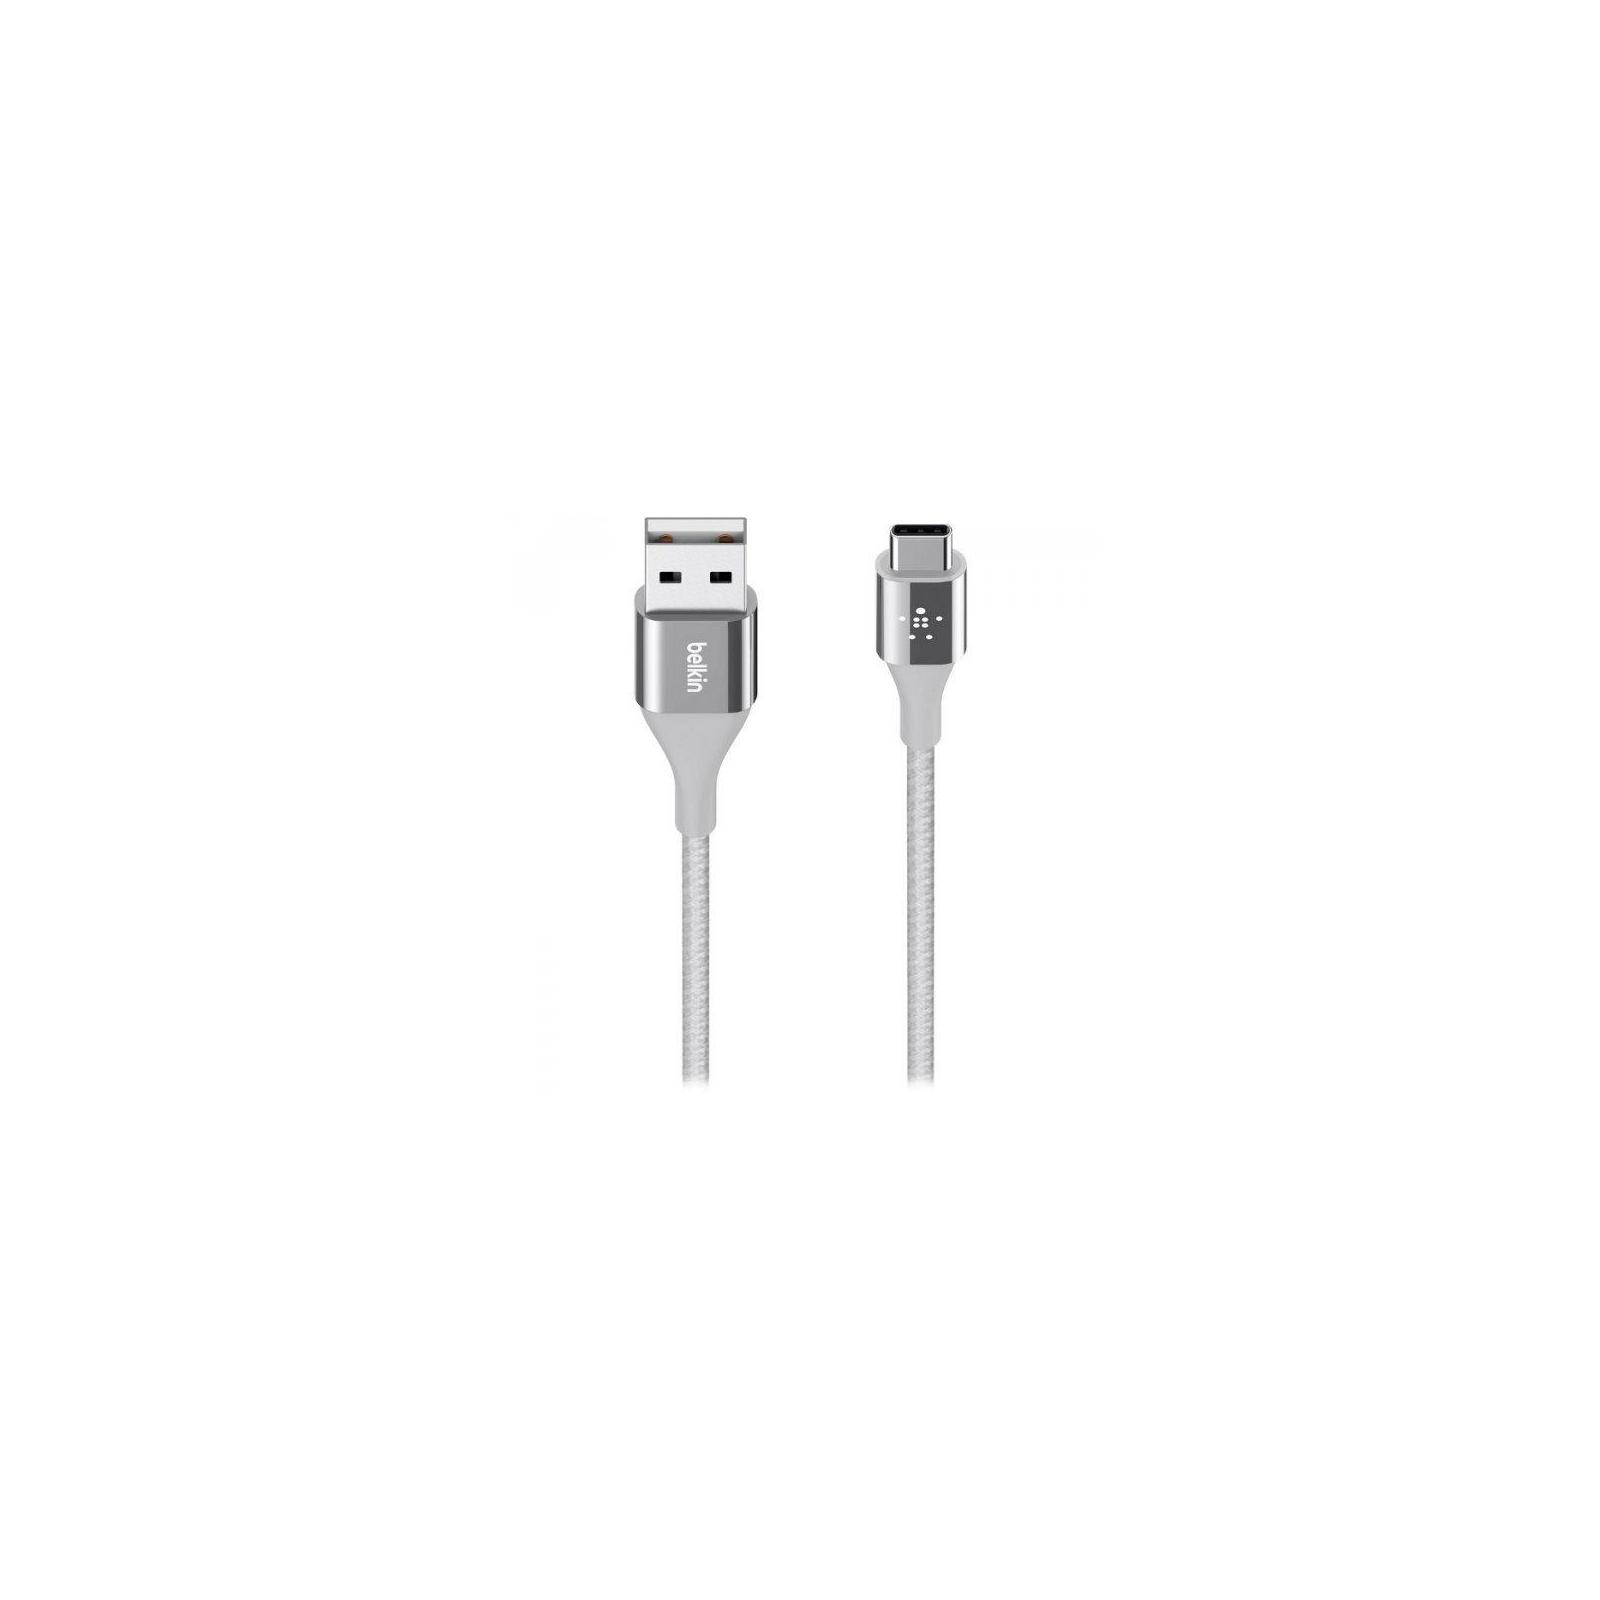 Дата кабель USB 2.0 AM to Type-C 1.2m MIXIT DuraTek silver Belkin (F2CU059BT04-SLV)